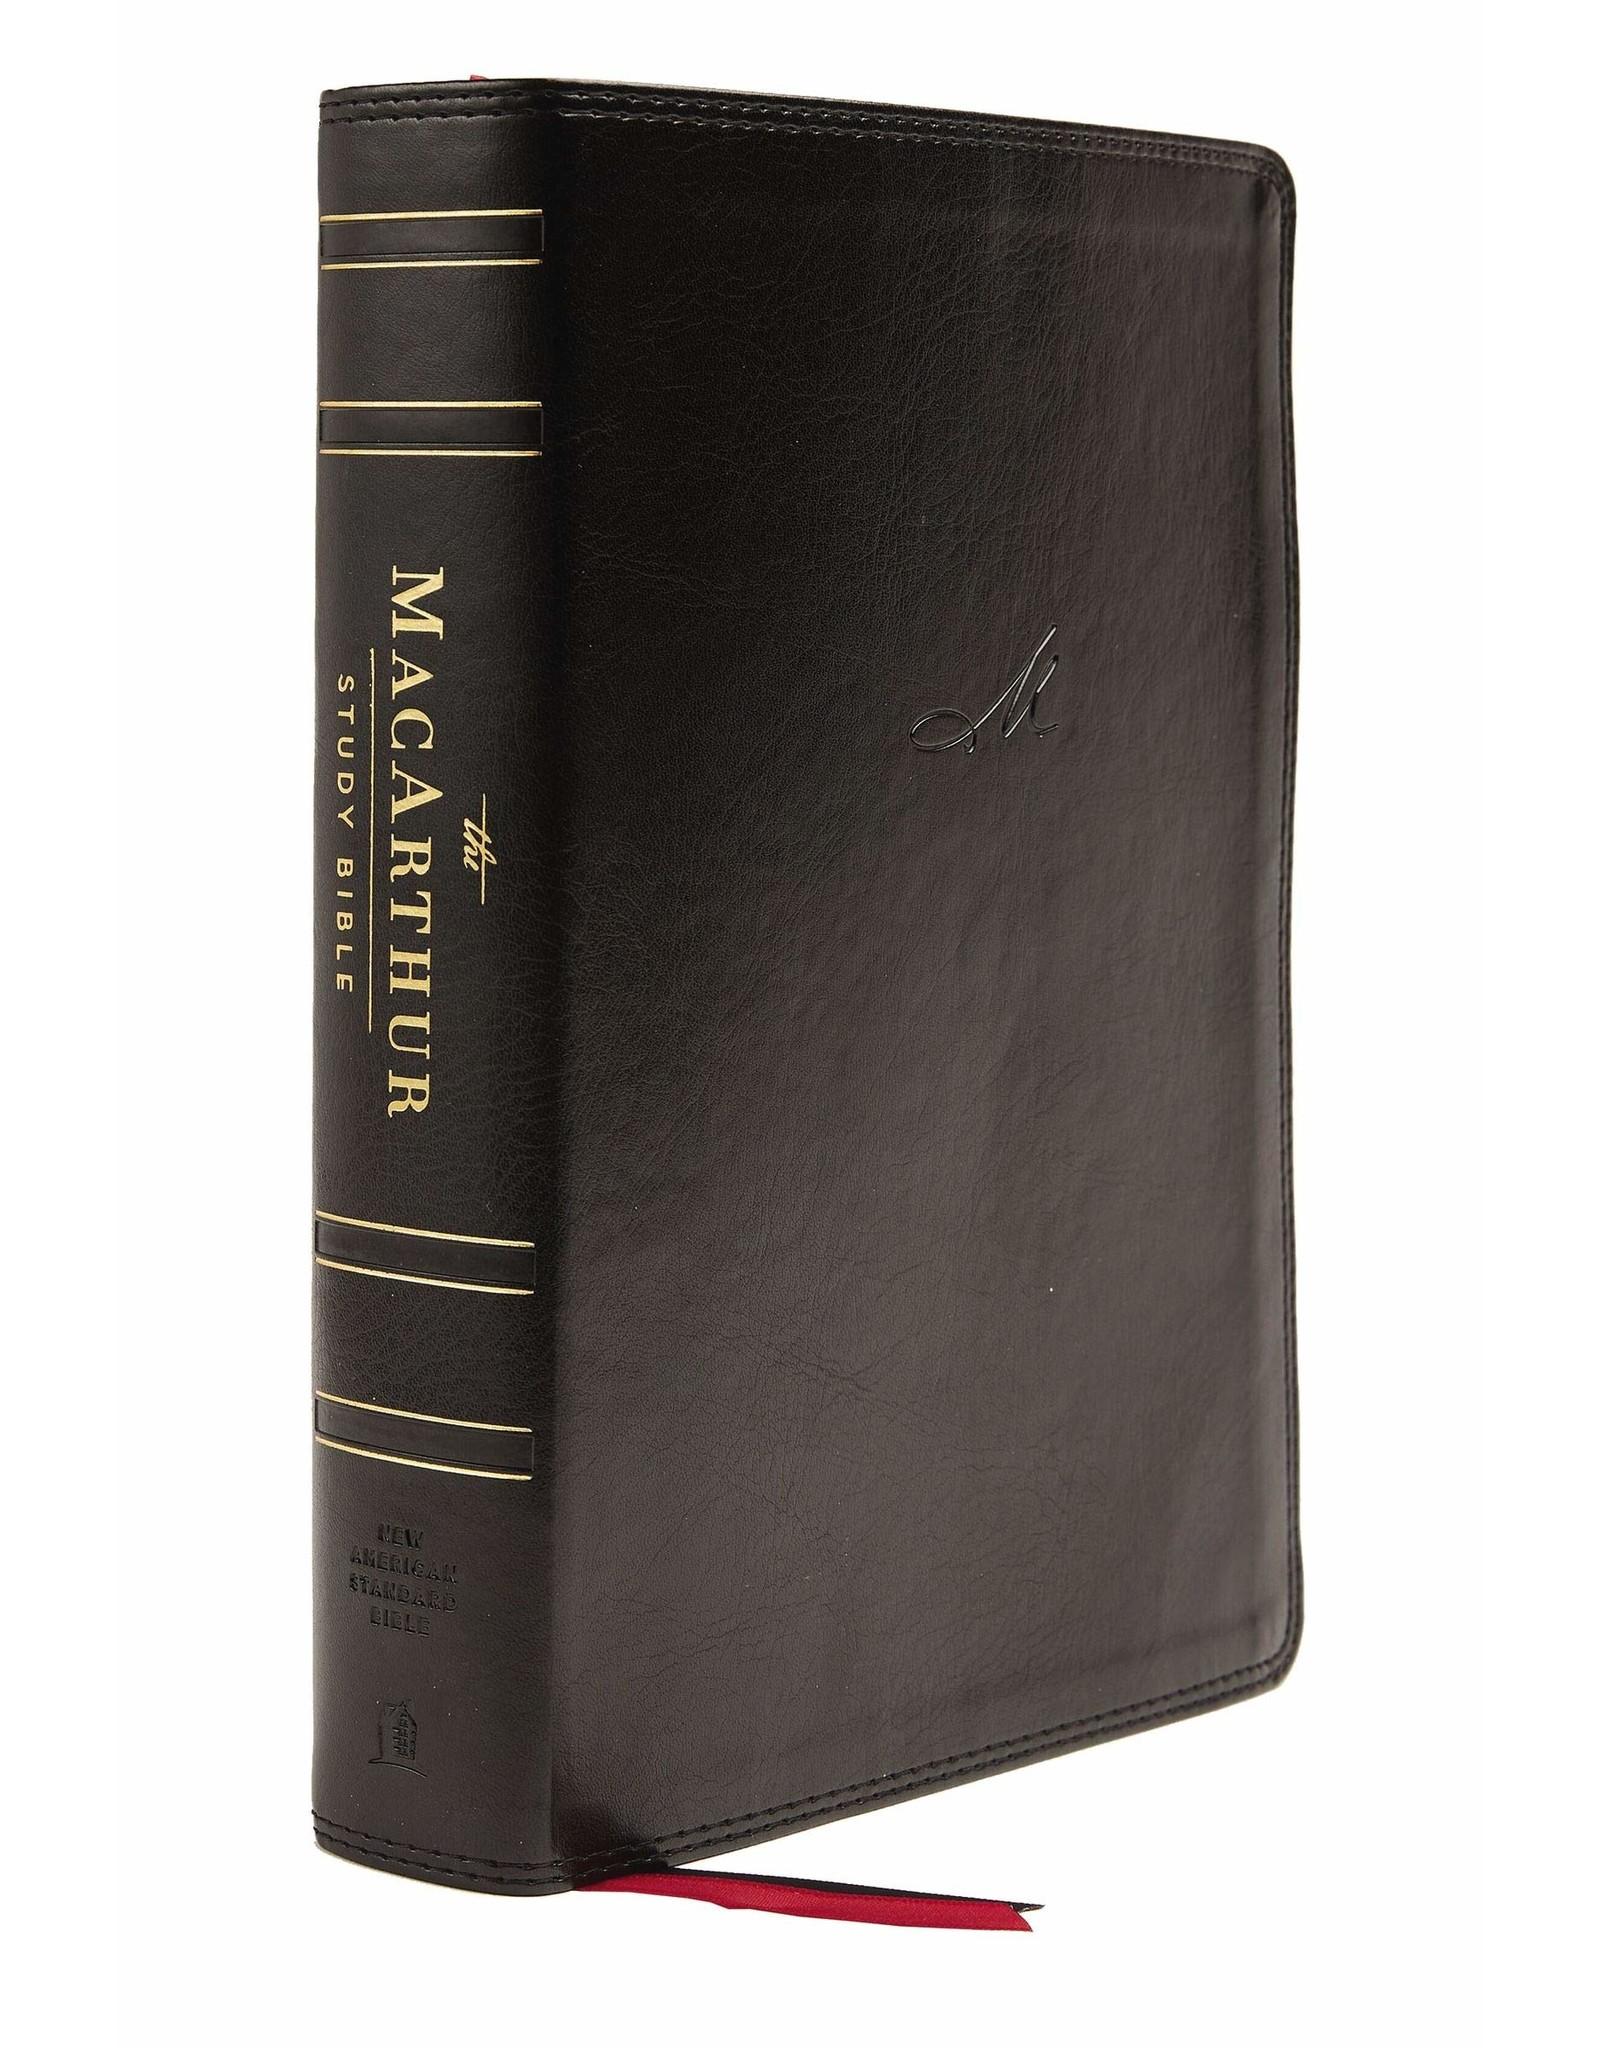 Harper Collins / Thomas Nelson / Zondervan NASB, MacArthur Study Bible, 2nd Edition, Leathersoft, Black, Comfort Print